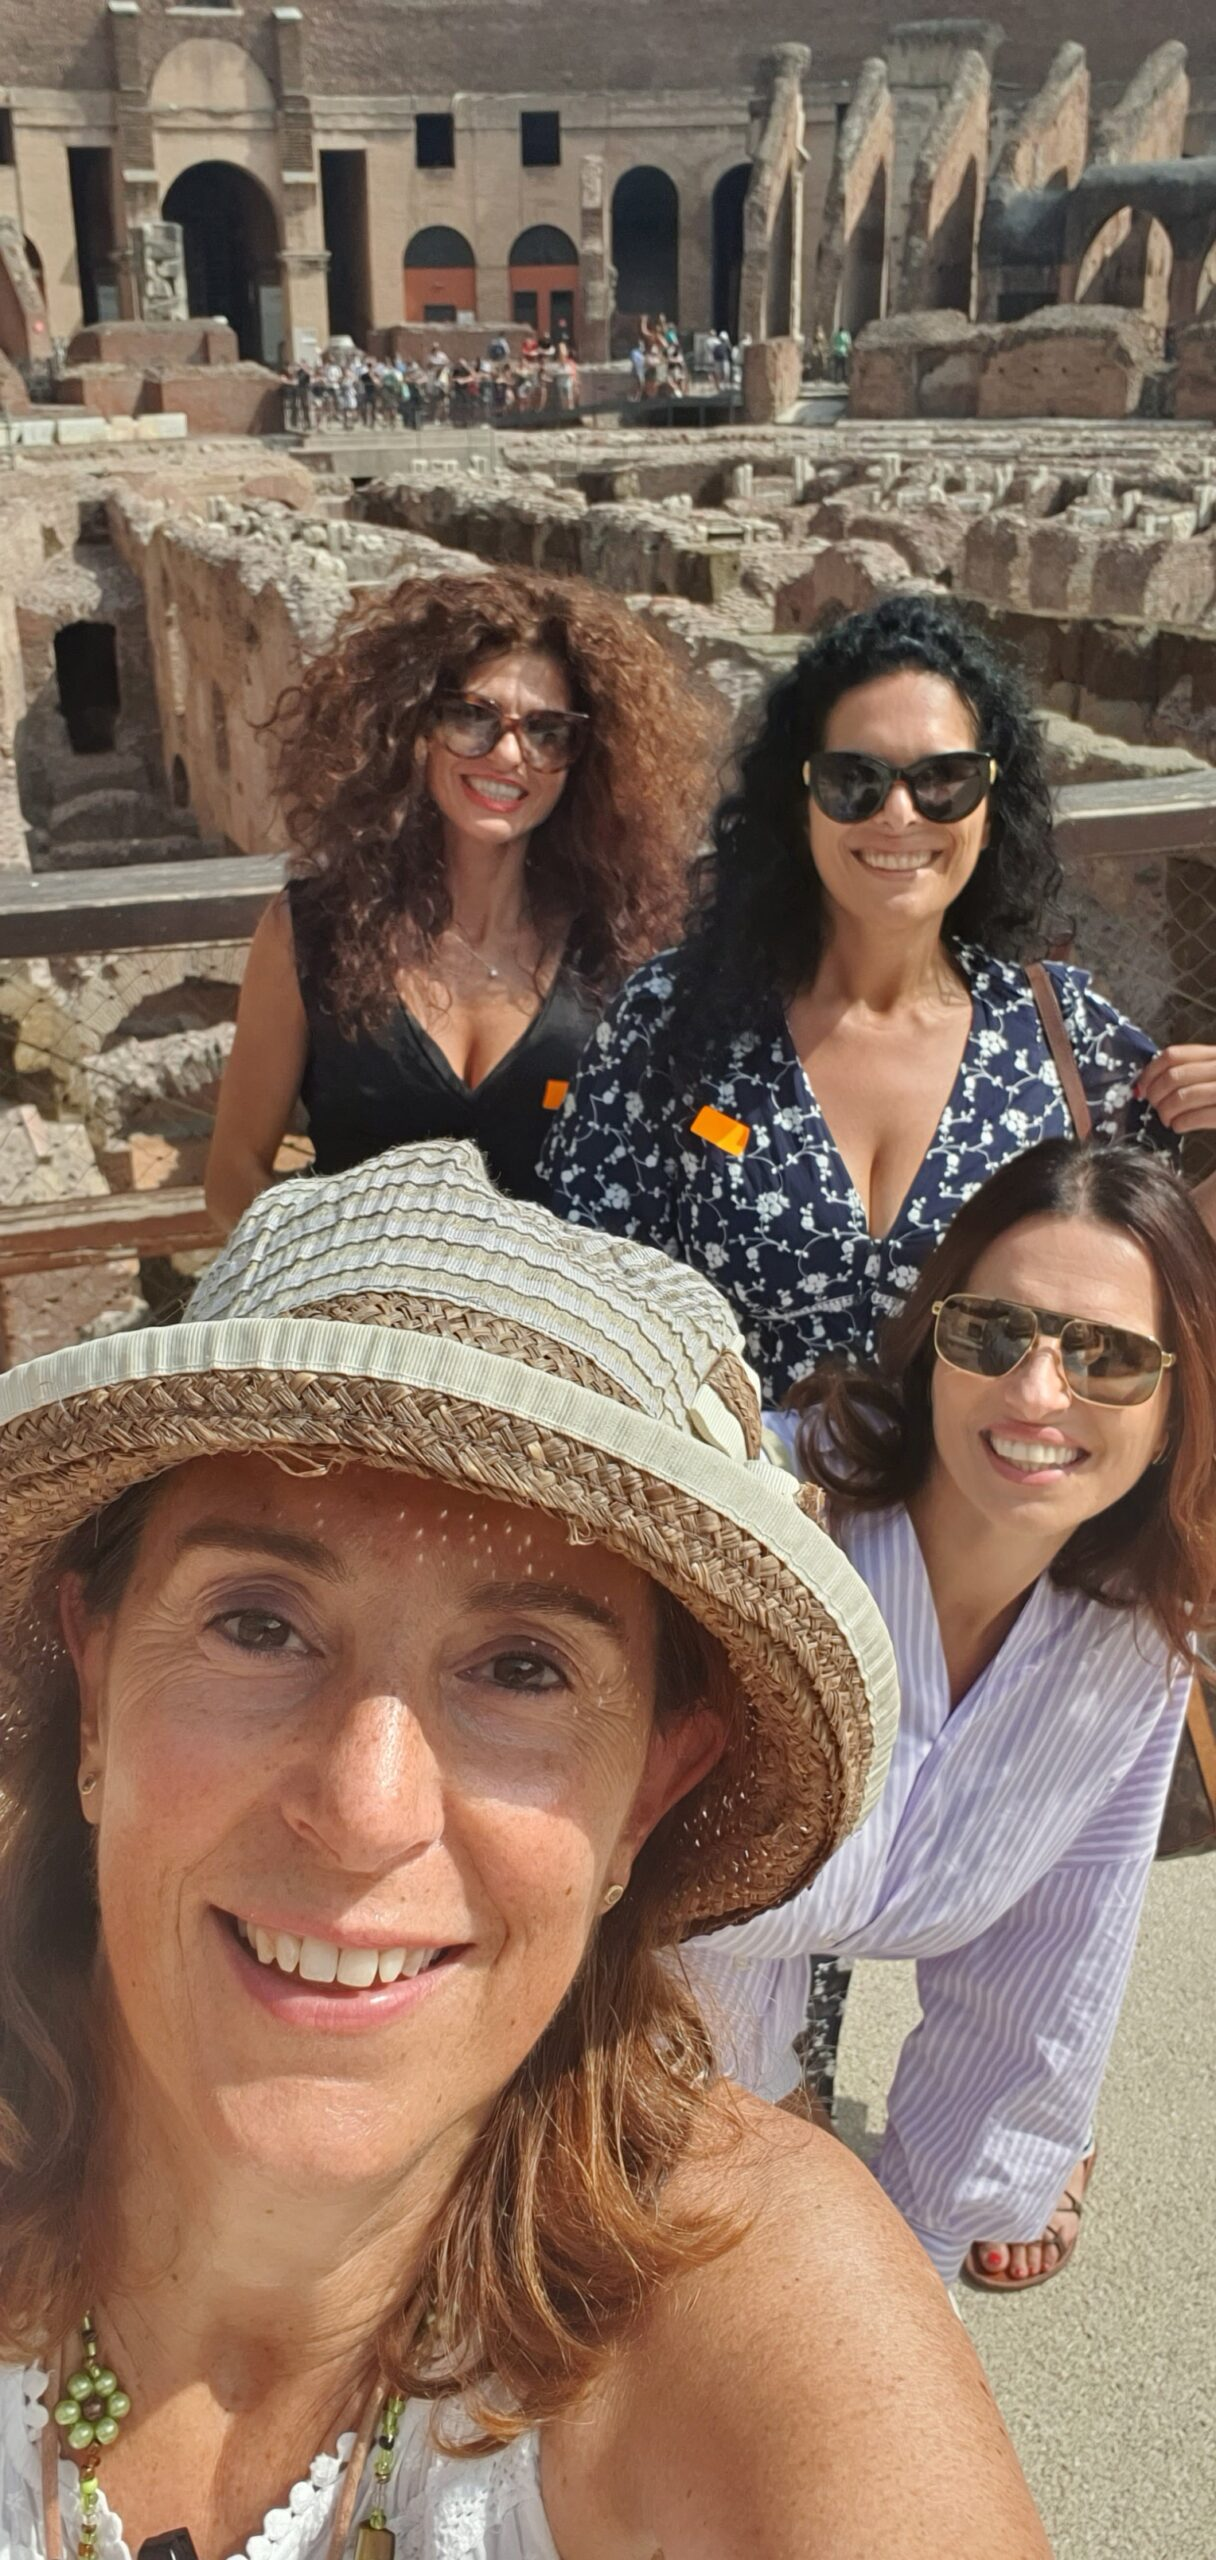 Colosseum, inside. Selfie with Alessandra Maria e Roberta from Puglia